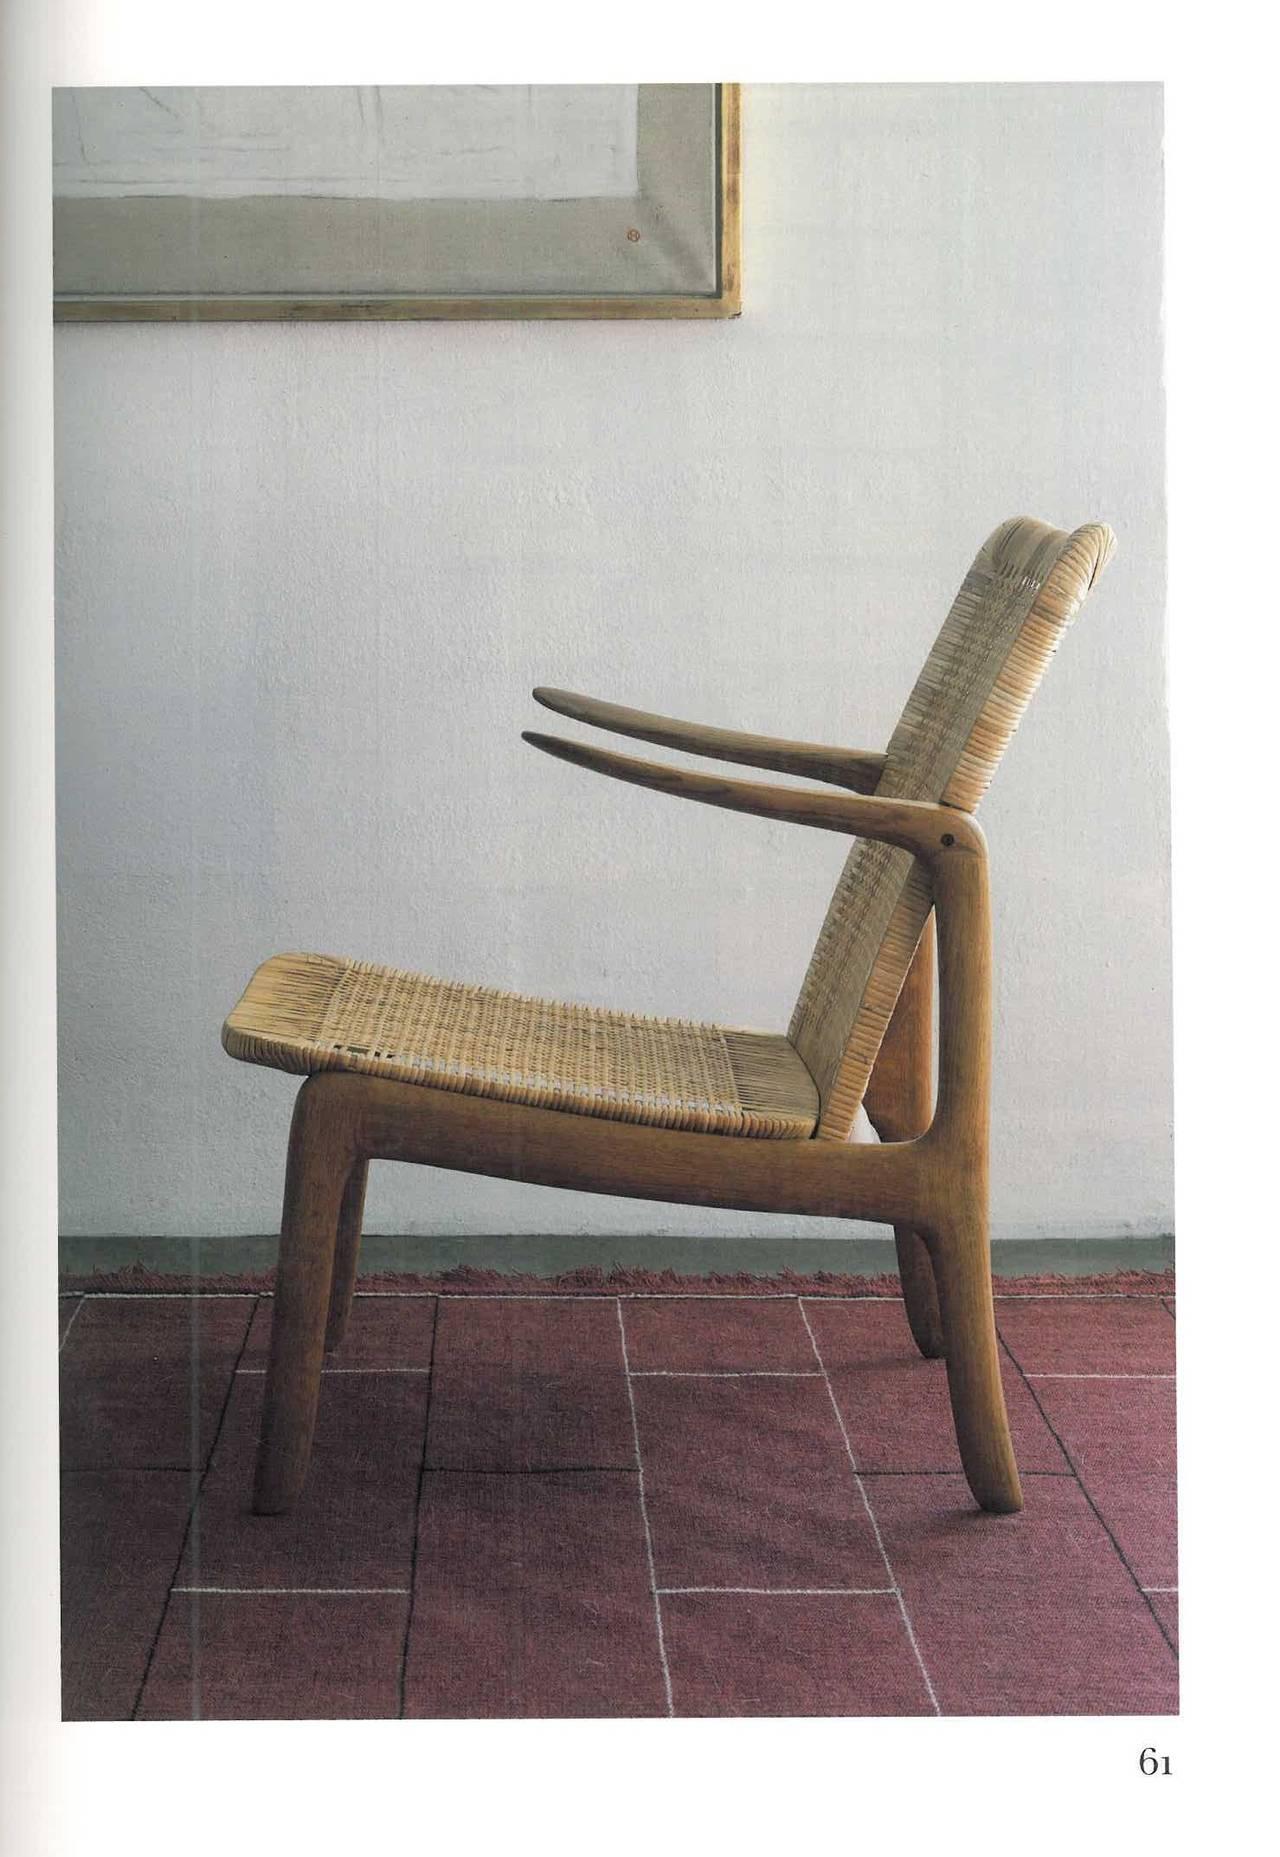 Danish furniture design in the 20th century two volume book 3